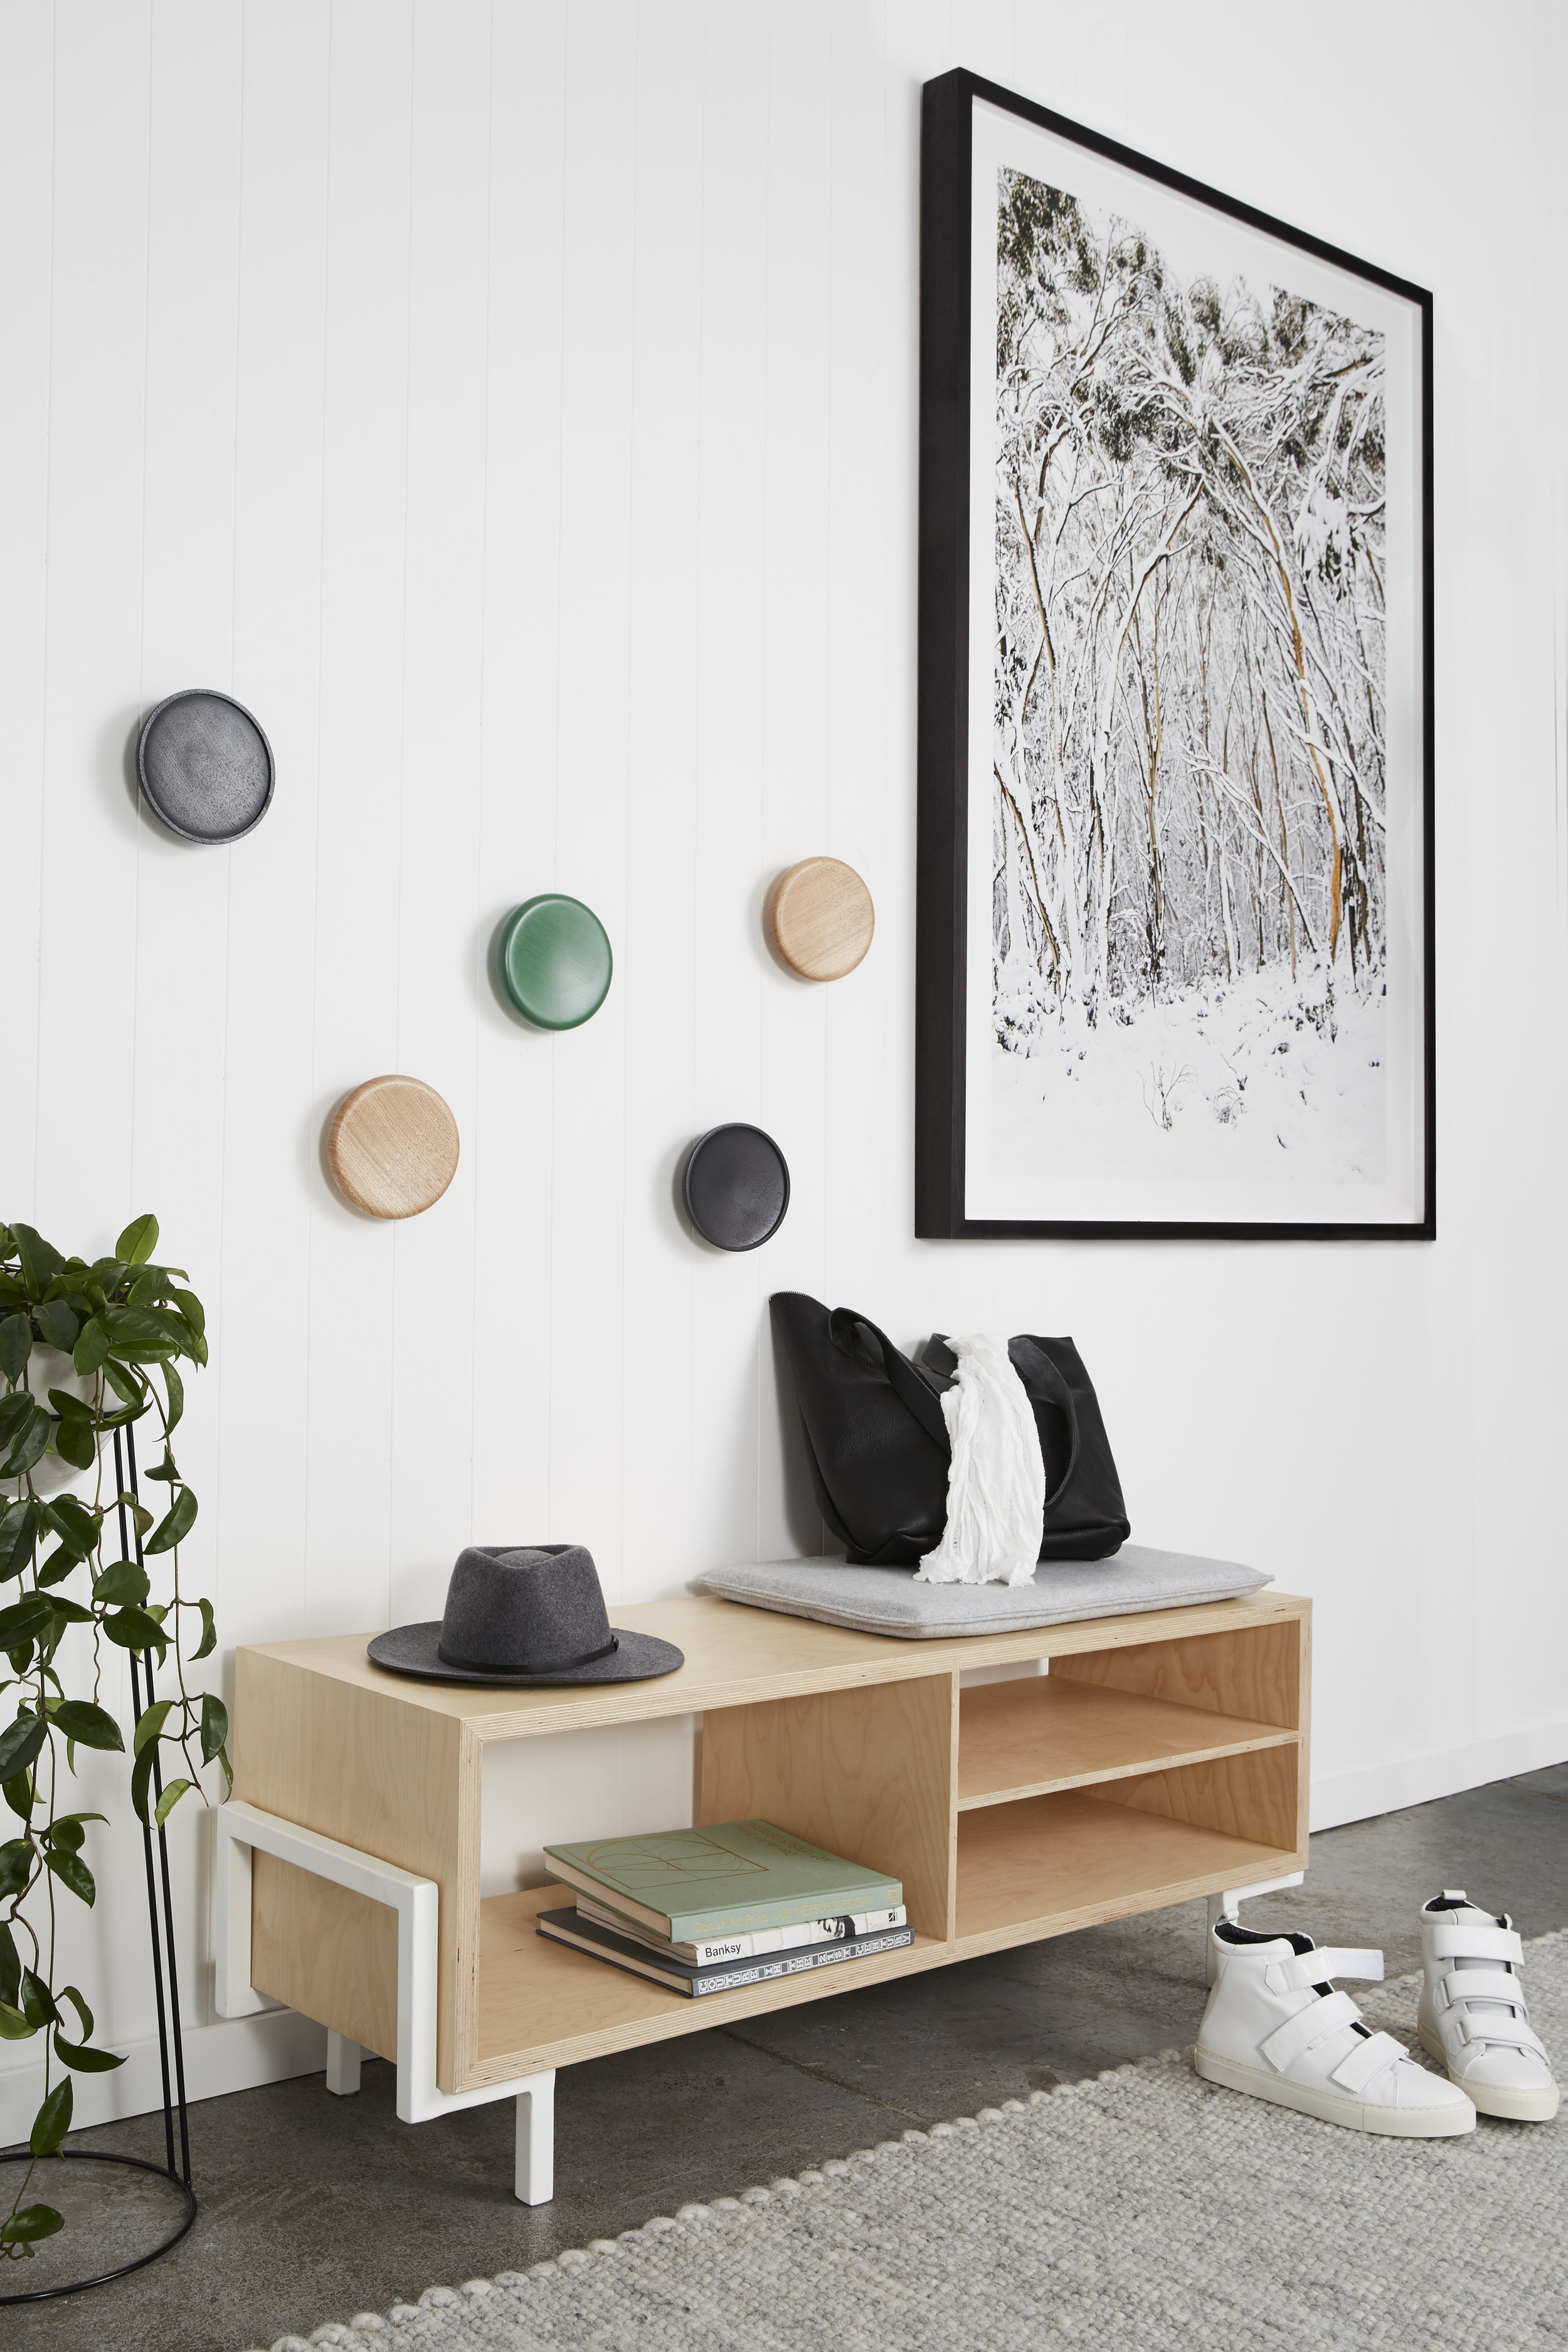 Styling: Sarah Elshaug, Maitland Street Interiors  Photography: Stephanie Rooney   Video: Jaz, Socialise Photography   Styling Assistant: Fiona Longmire